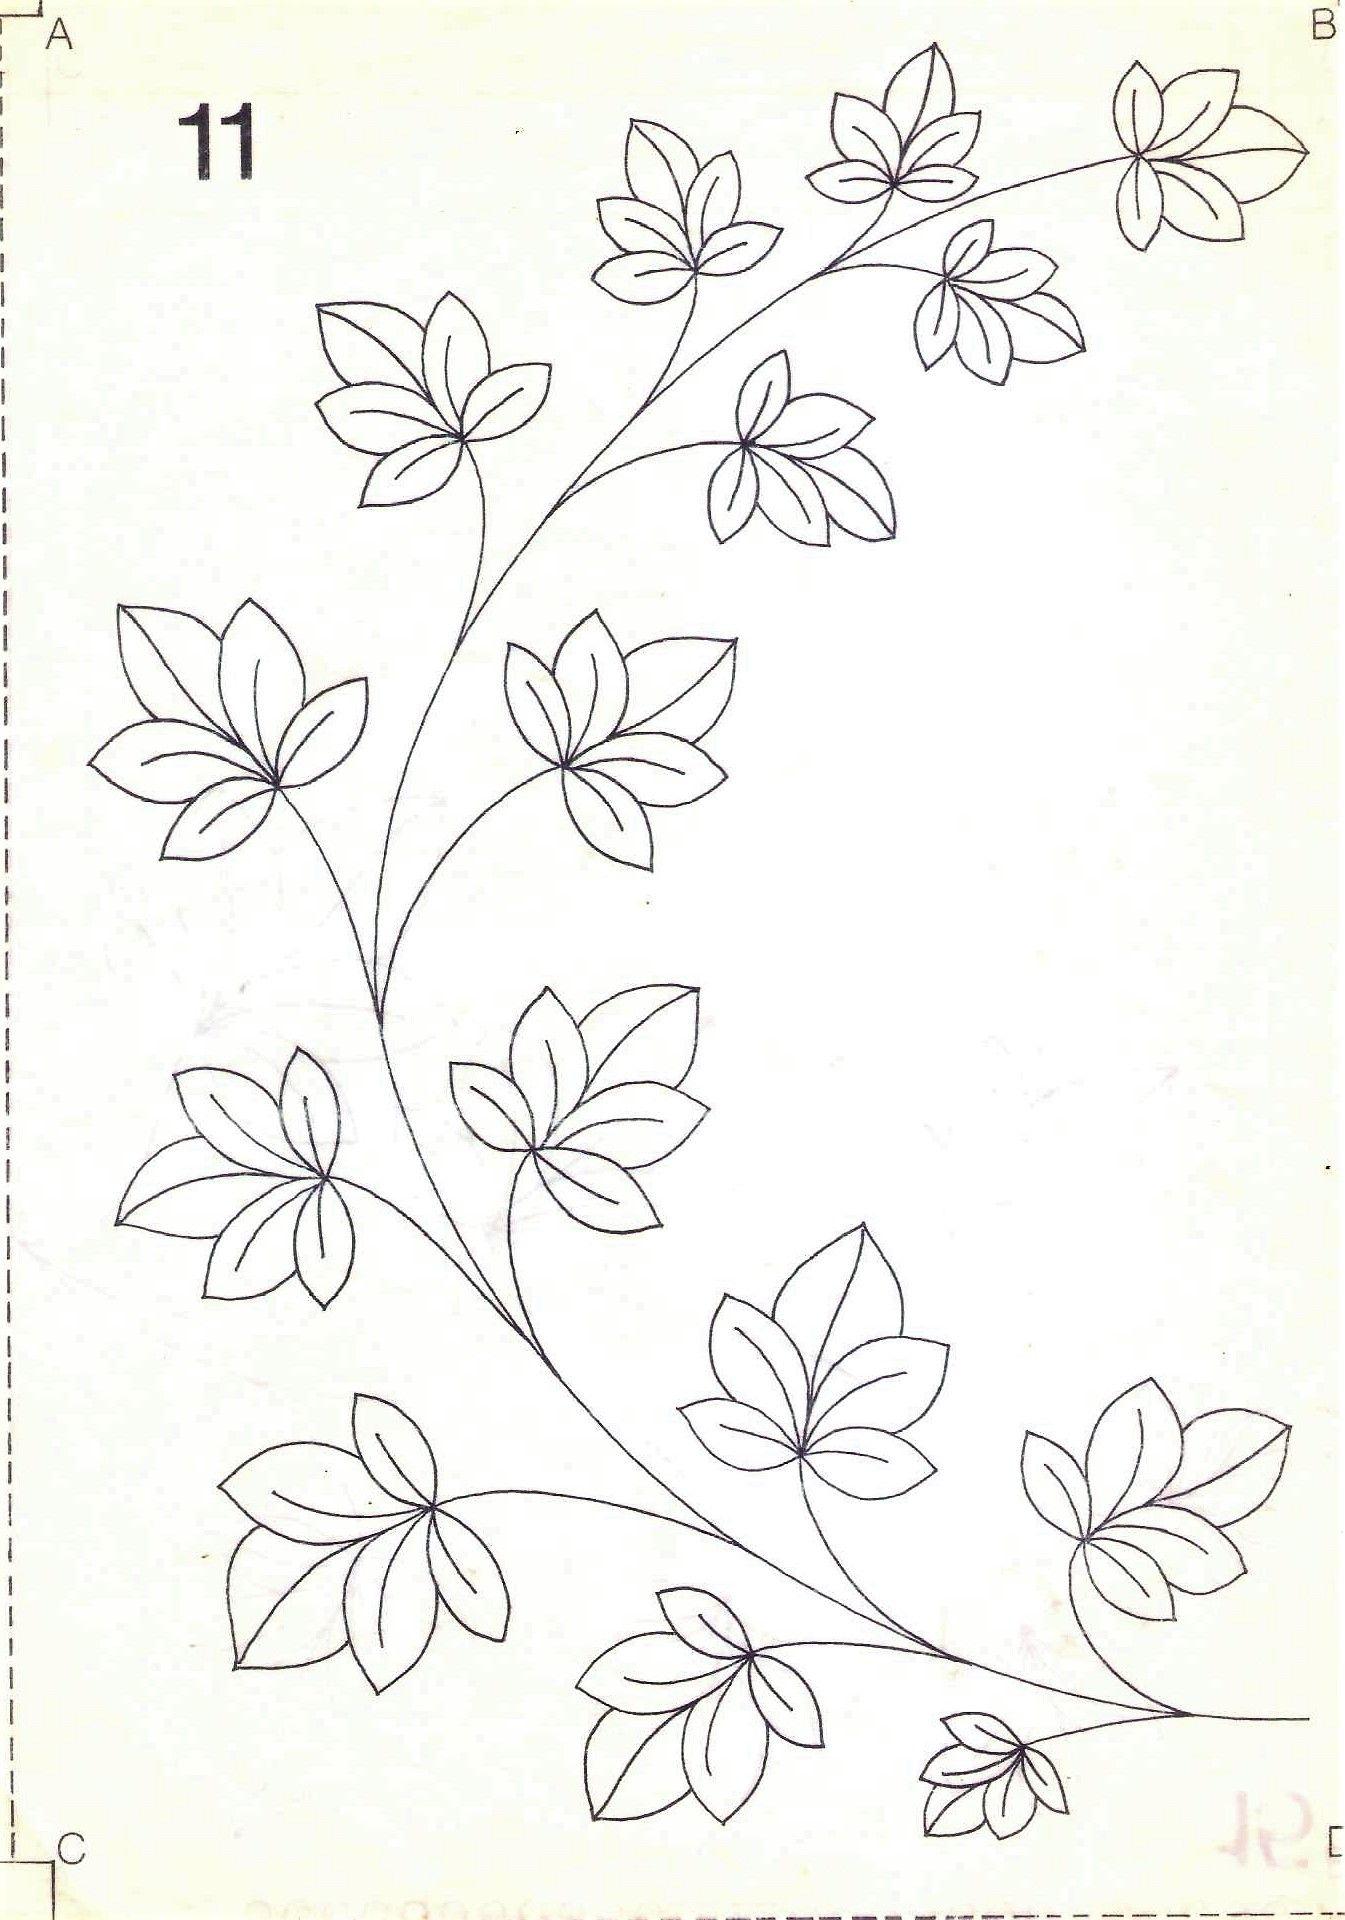 Pin by Brinda Suchde on Embroidery | Bordado, Dibujos para bordar ...